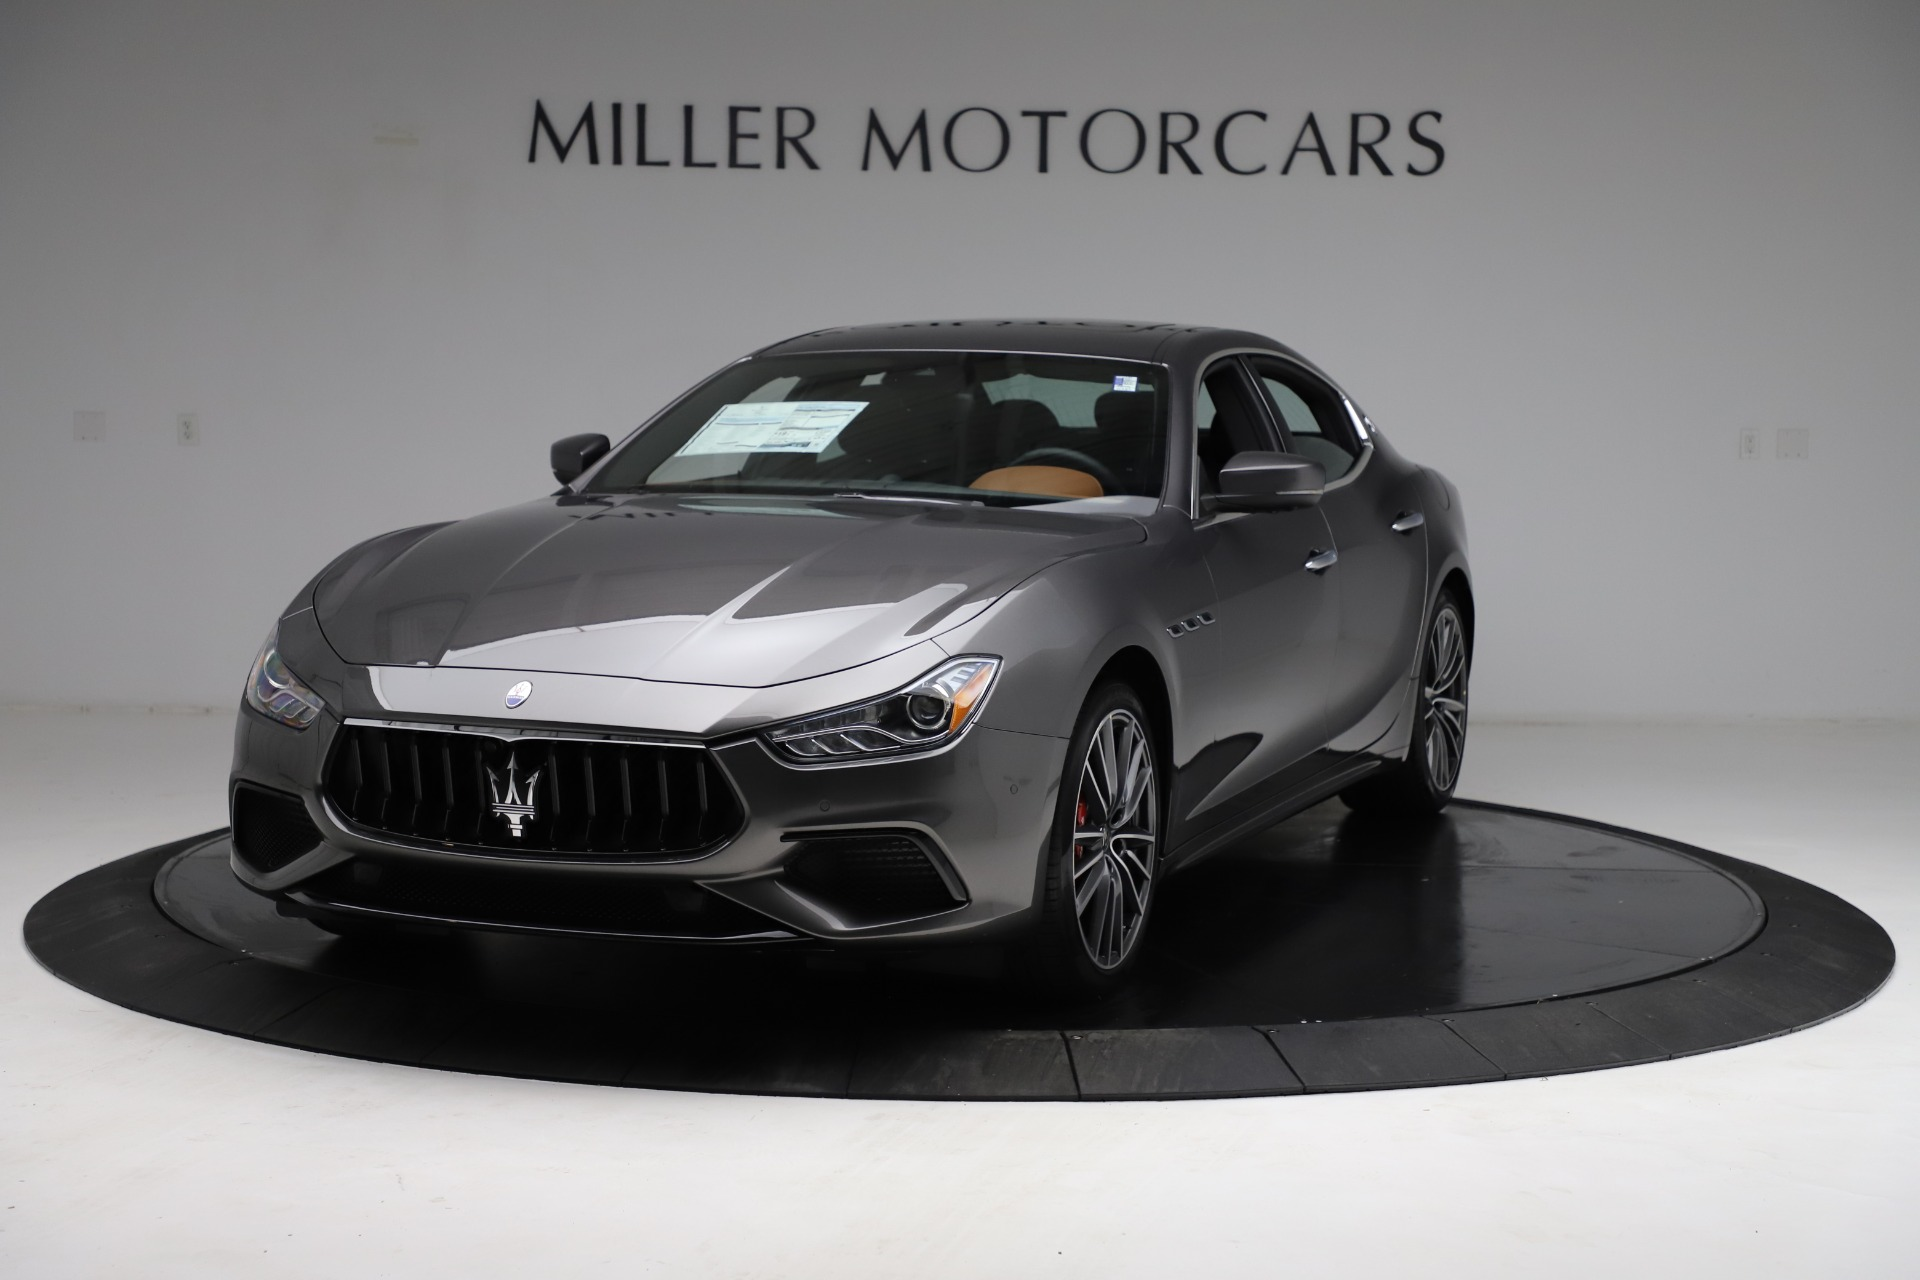 New 2021 Maserati Ghibli S Q4 for sale $90,525 at Pagani of Greenwich in Greenwich CT 06830 1